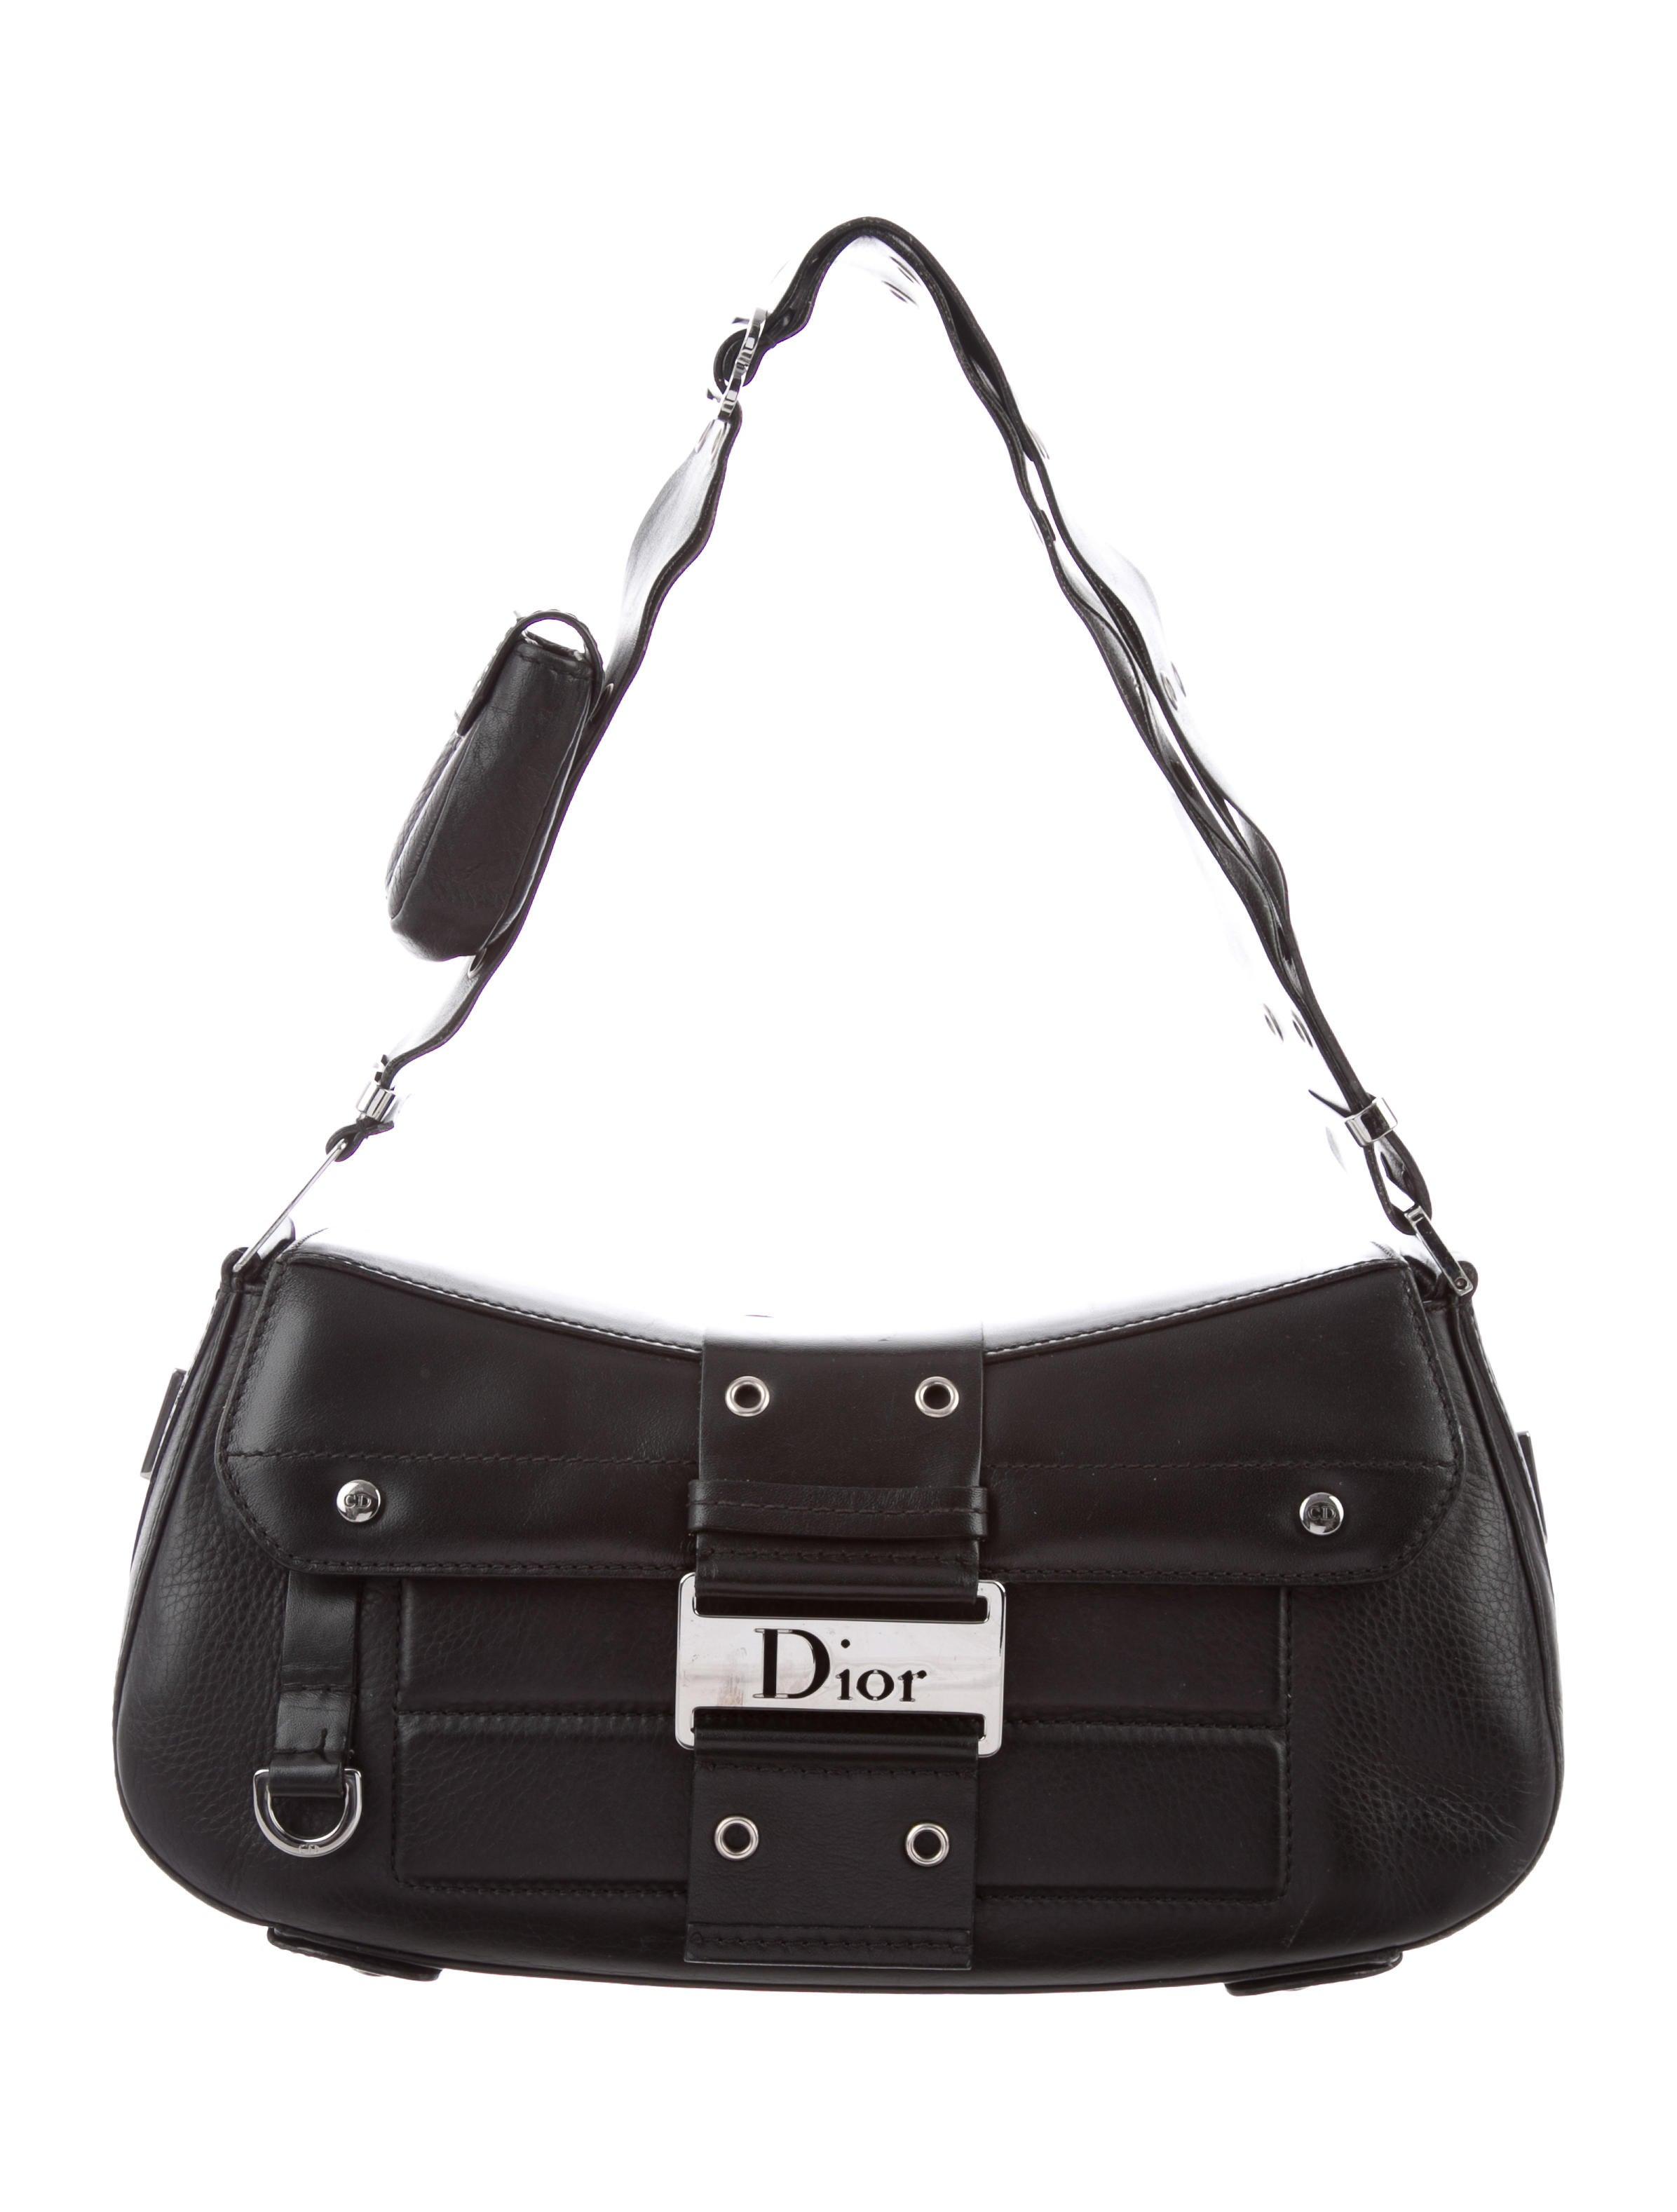 Christian Dior Street Chic Columbus Bag - Handbags